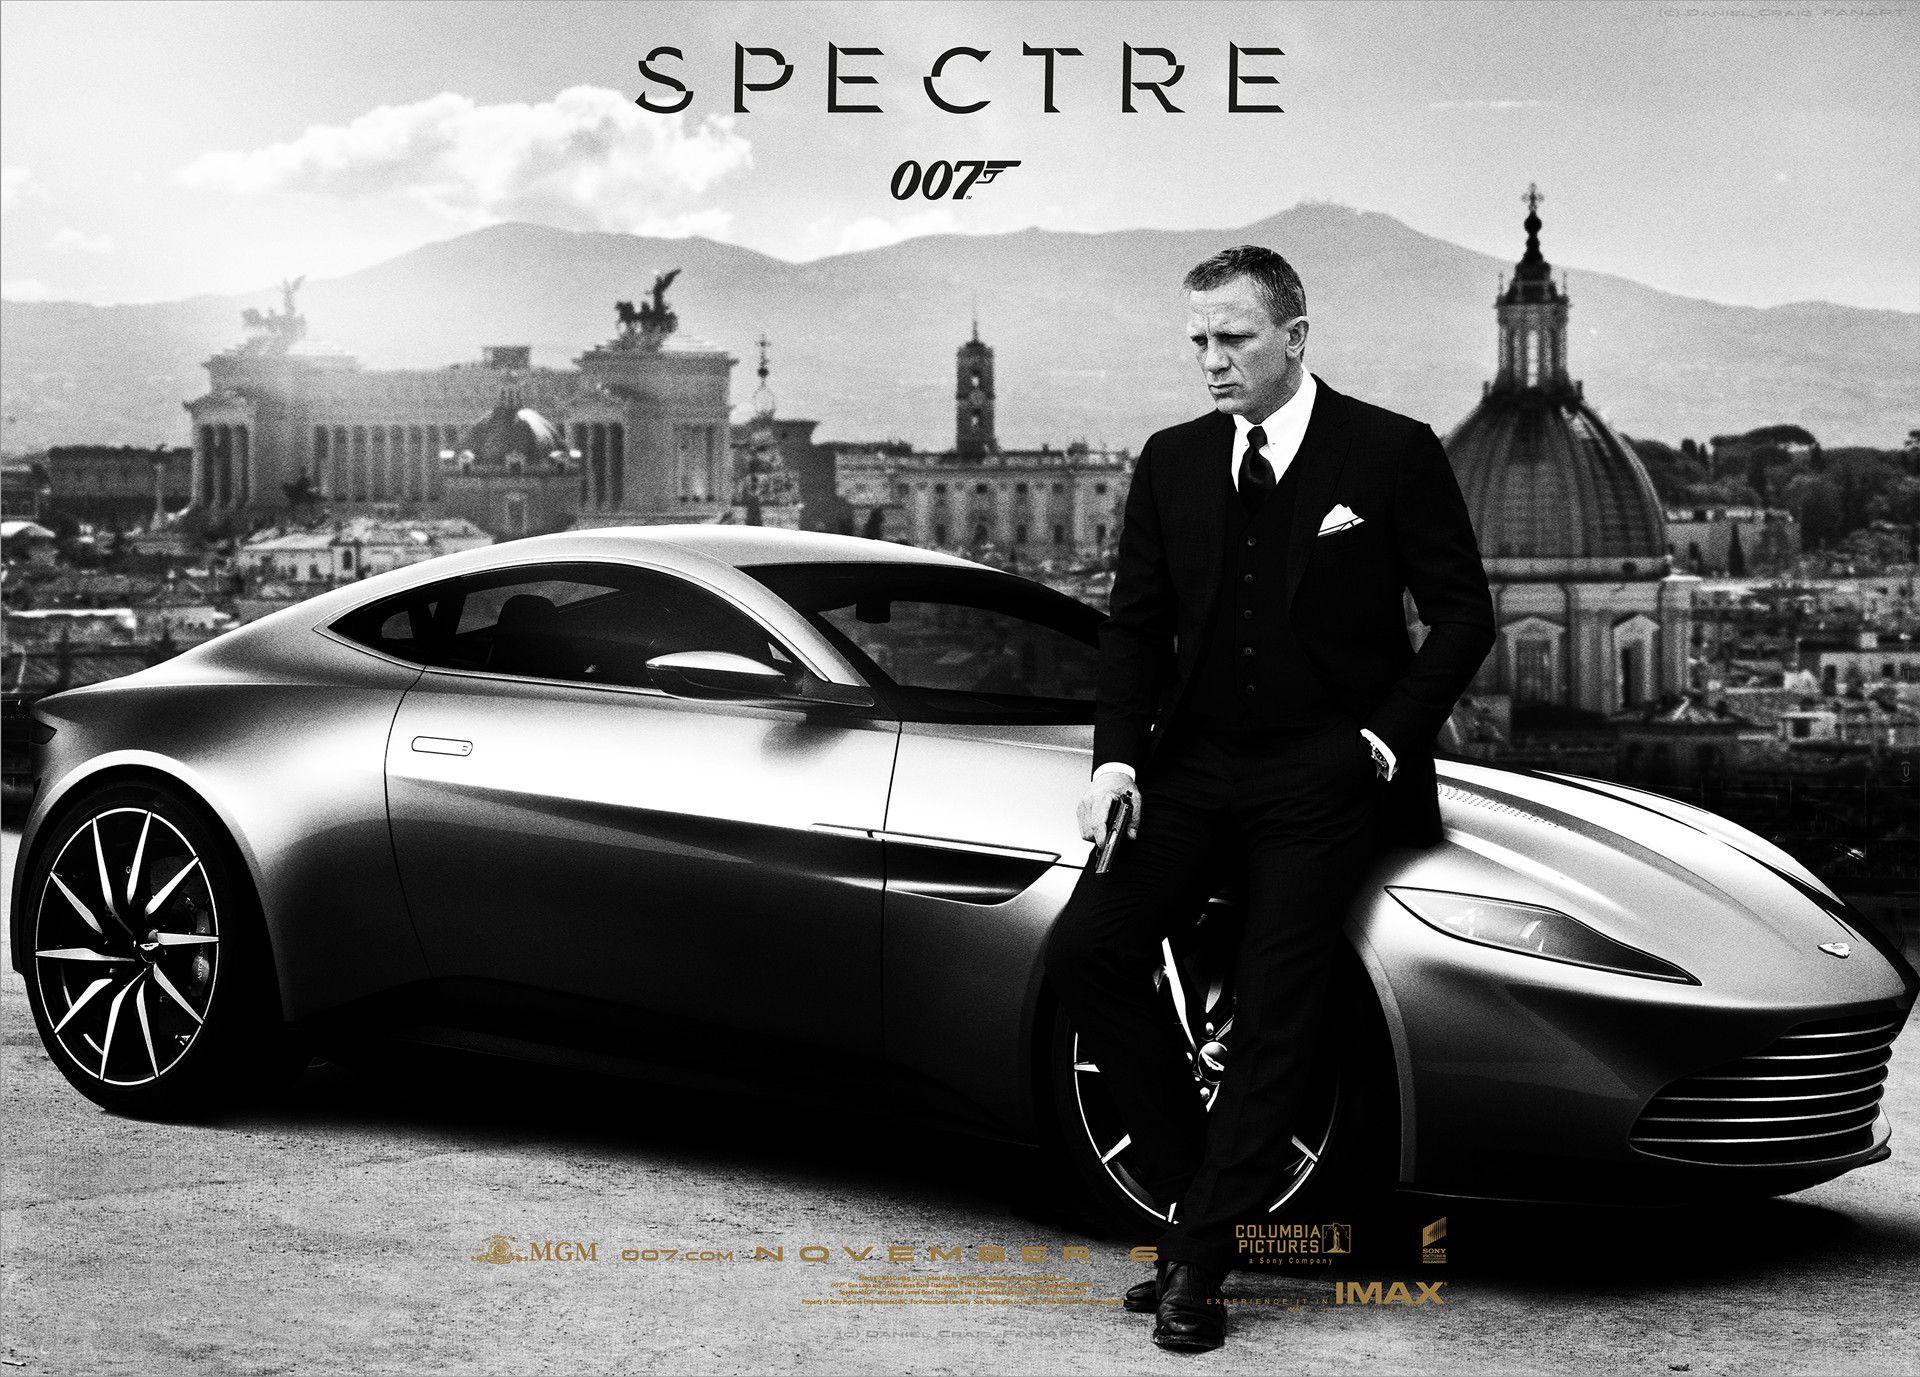 James Bond Film Spectre Movie Wallpapers Daniel Craig James Bond James Bond Spectre James Bond Movies